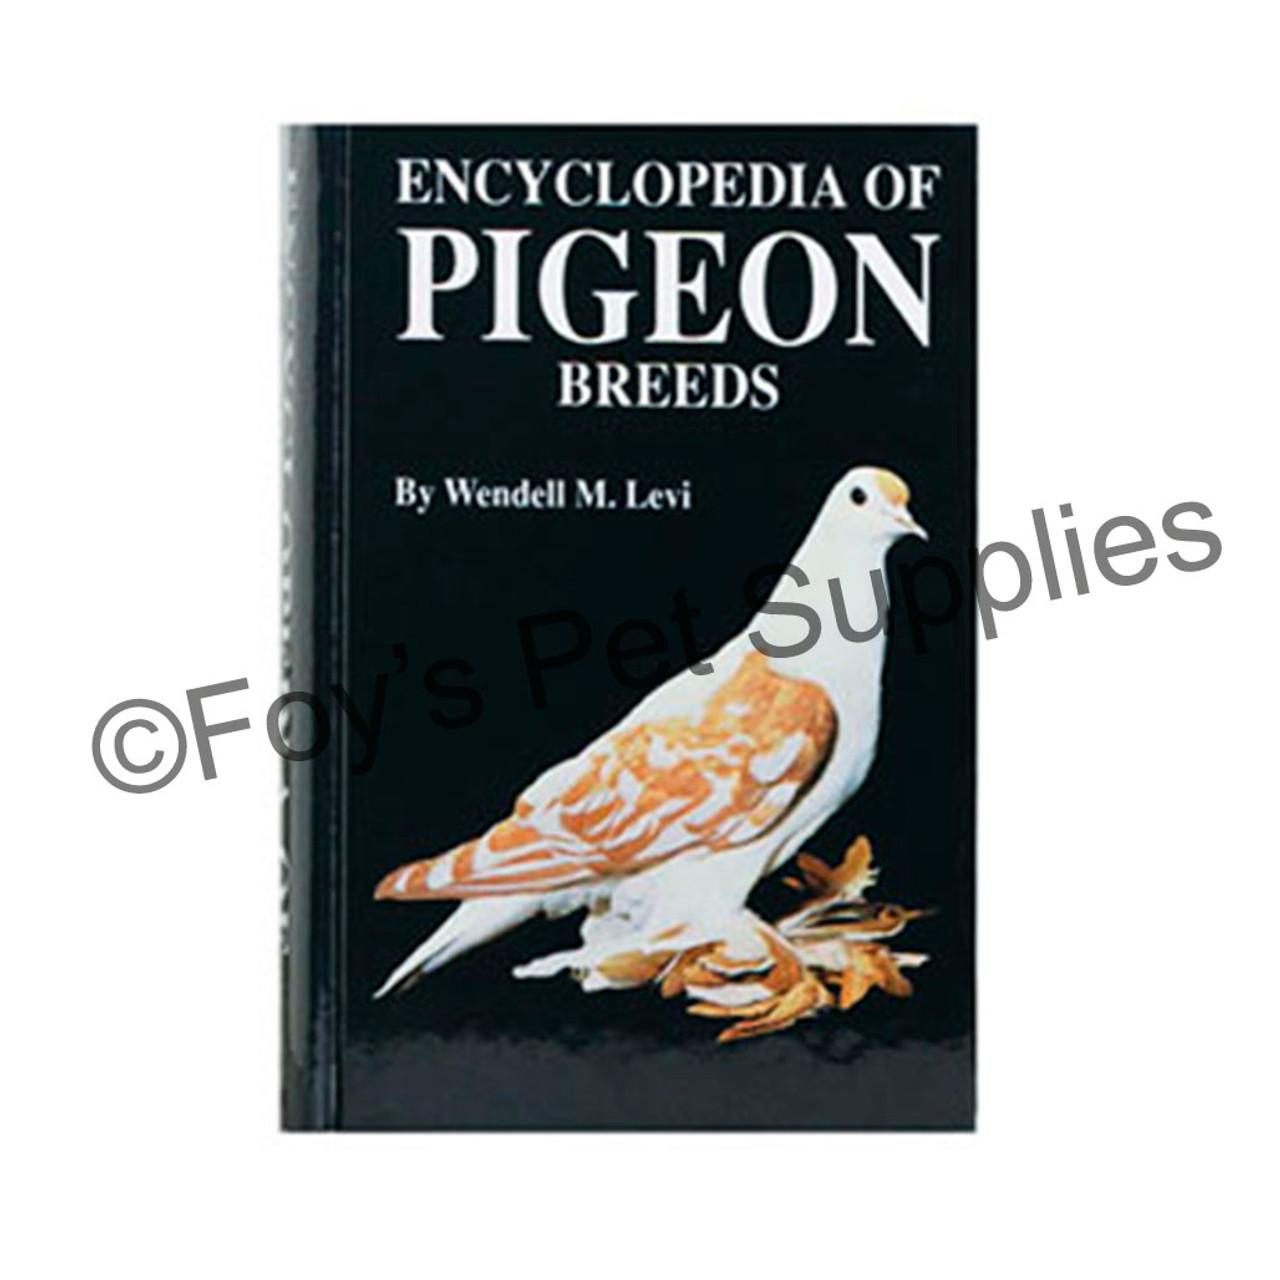 Encyclopedia of Pigeon Breeds